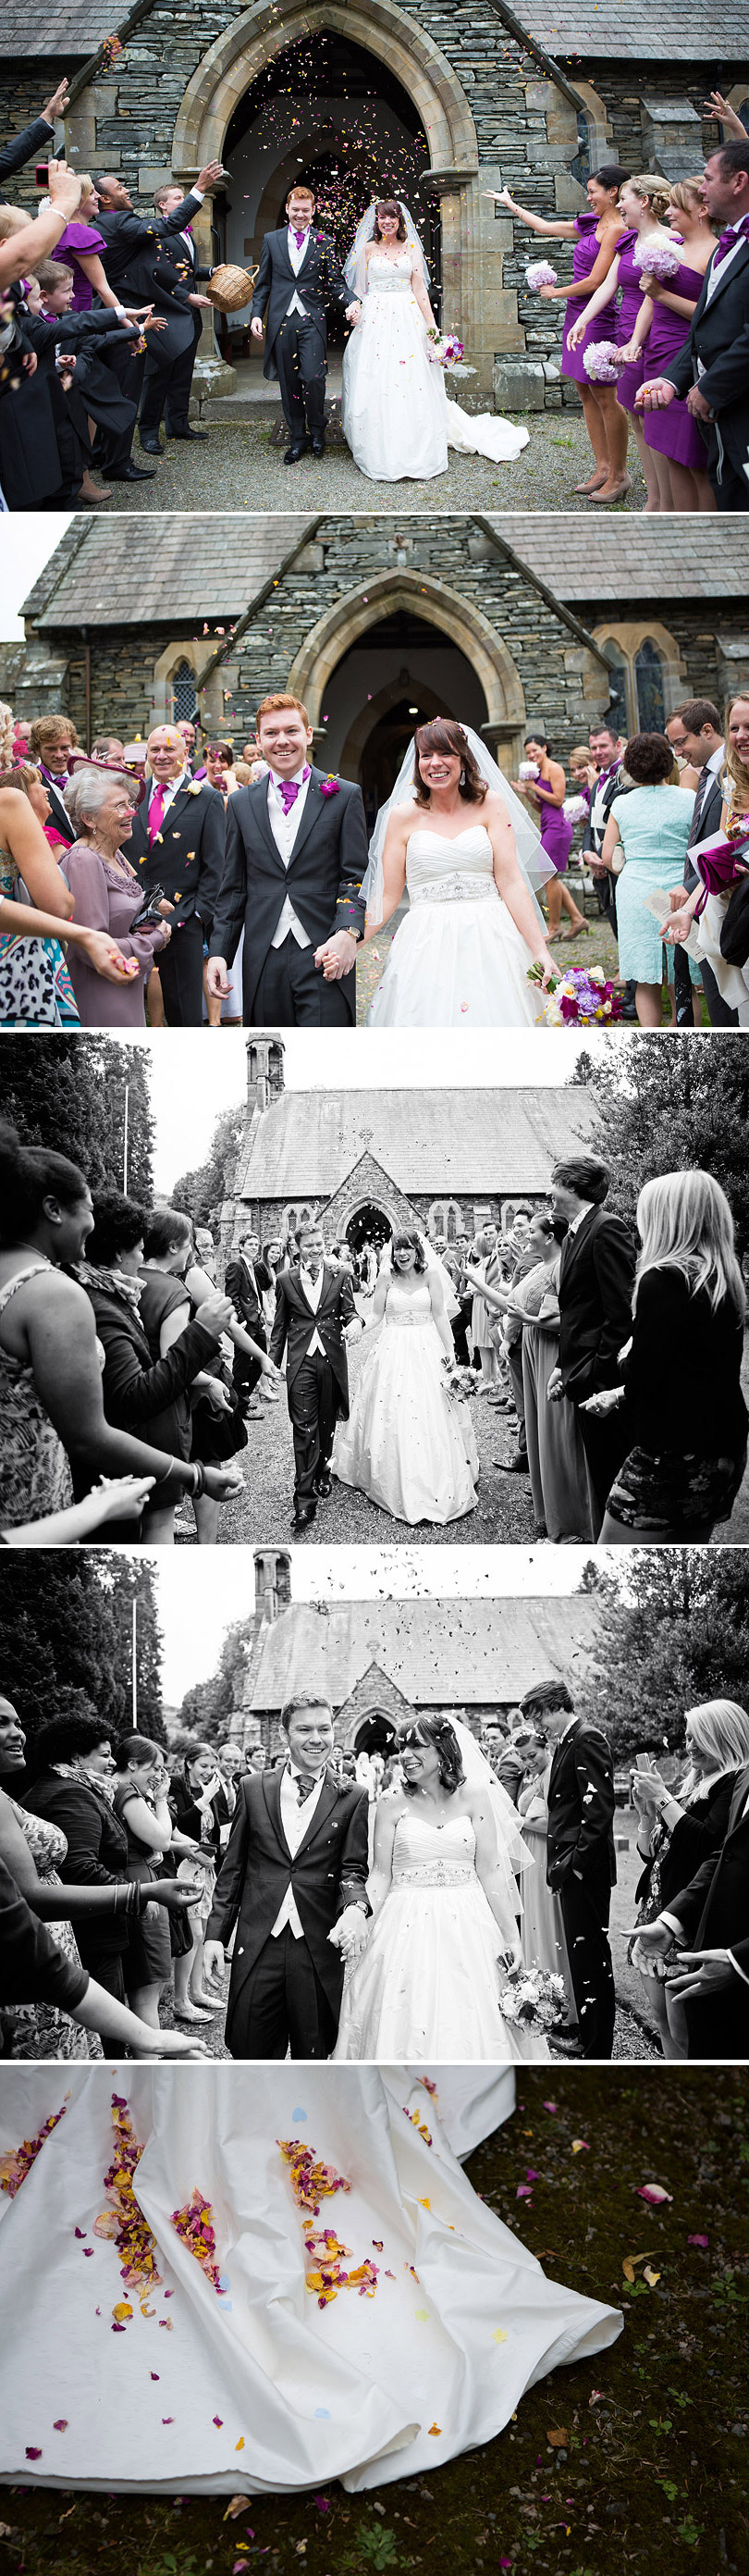 Langdale-Chase-Wedding-8.jpg